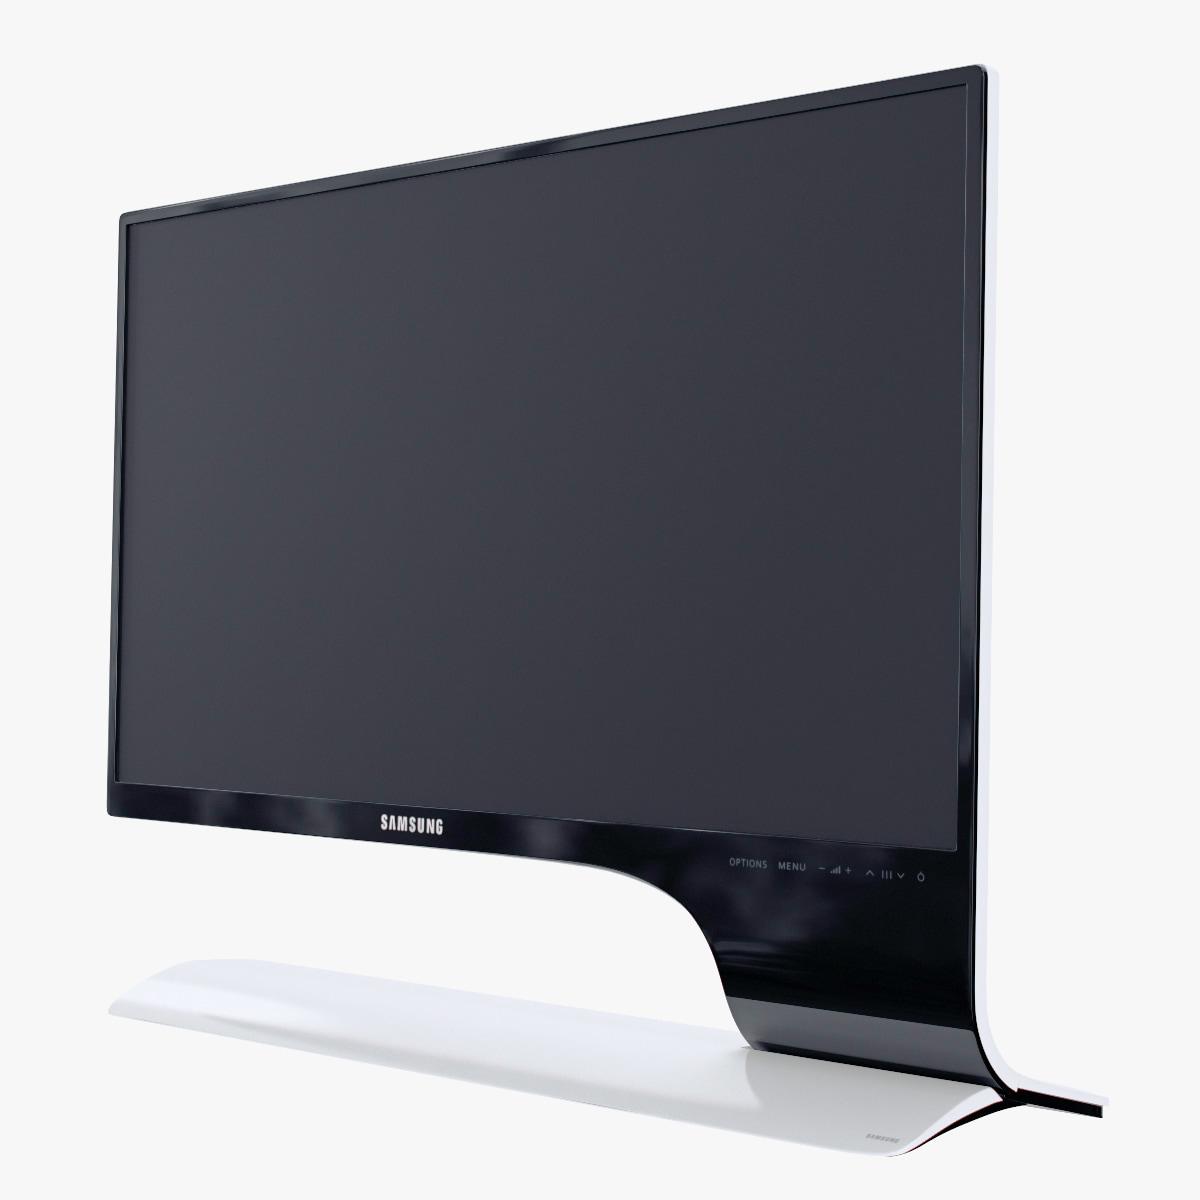 Samsung_Monitor_main.jpg